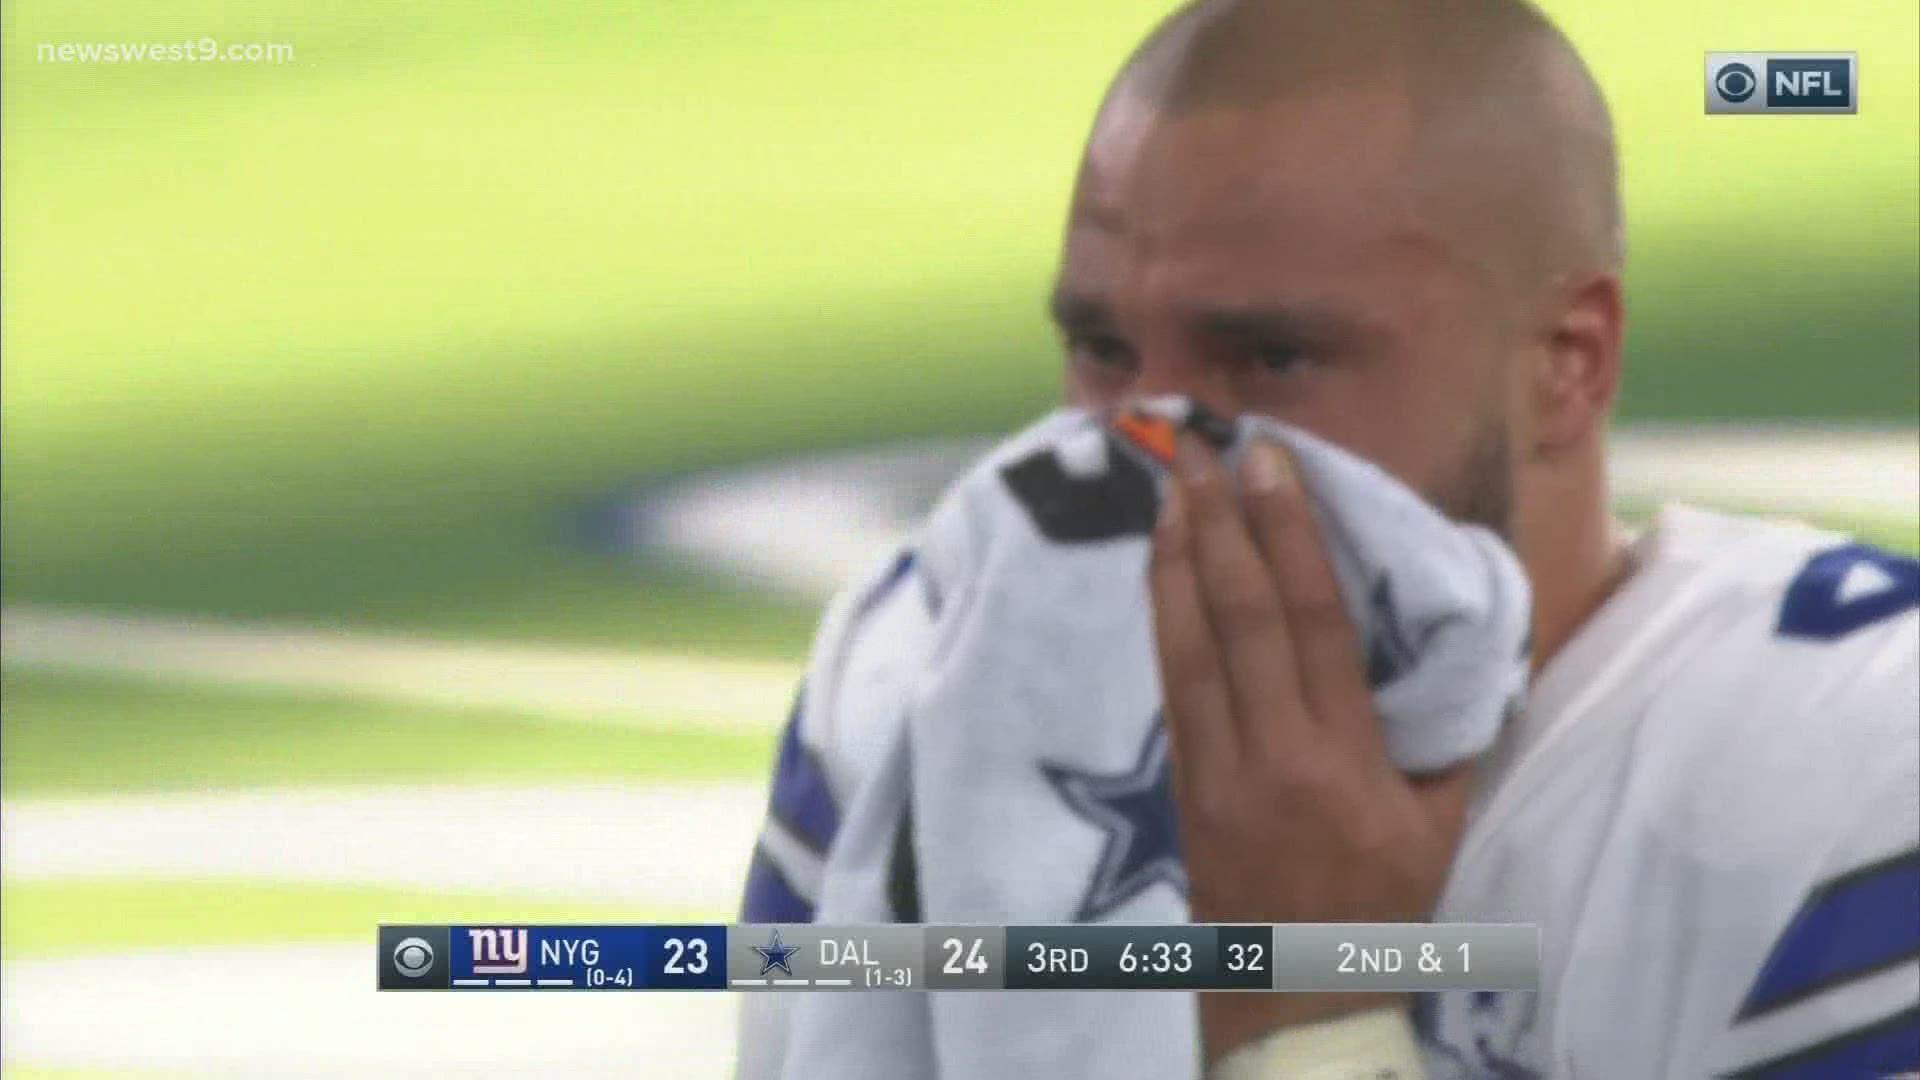 Dallas Cowboys Qb Dak Prescott Fractures Right Ankle Team Says Newswest9 Com